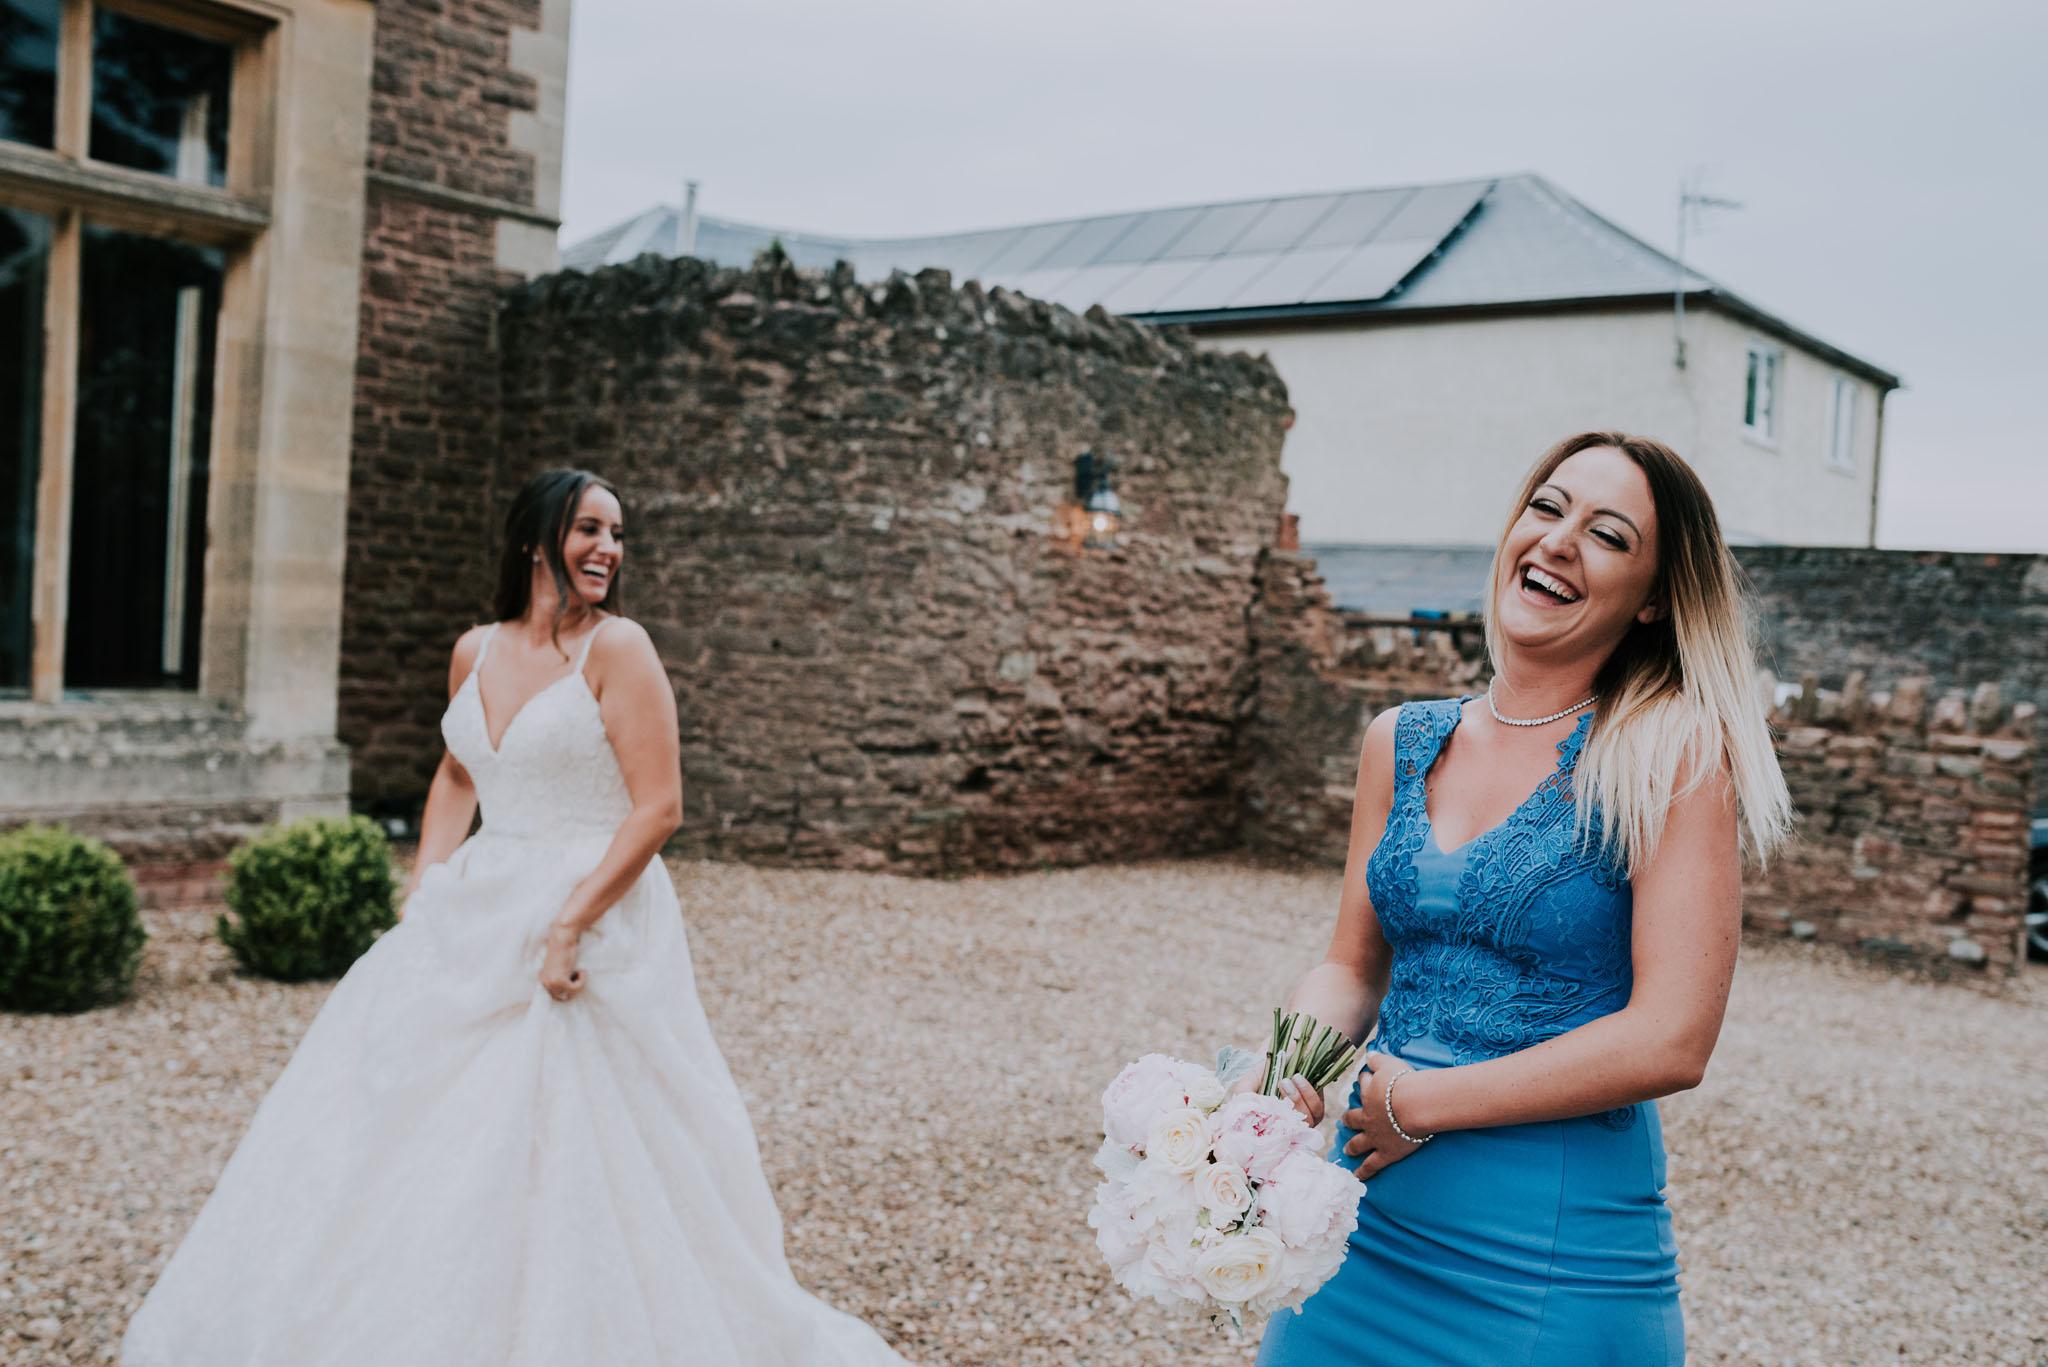 wedding-photographer-glewstone-court-hereford-scott-stockwell-photography468.jpg